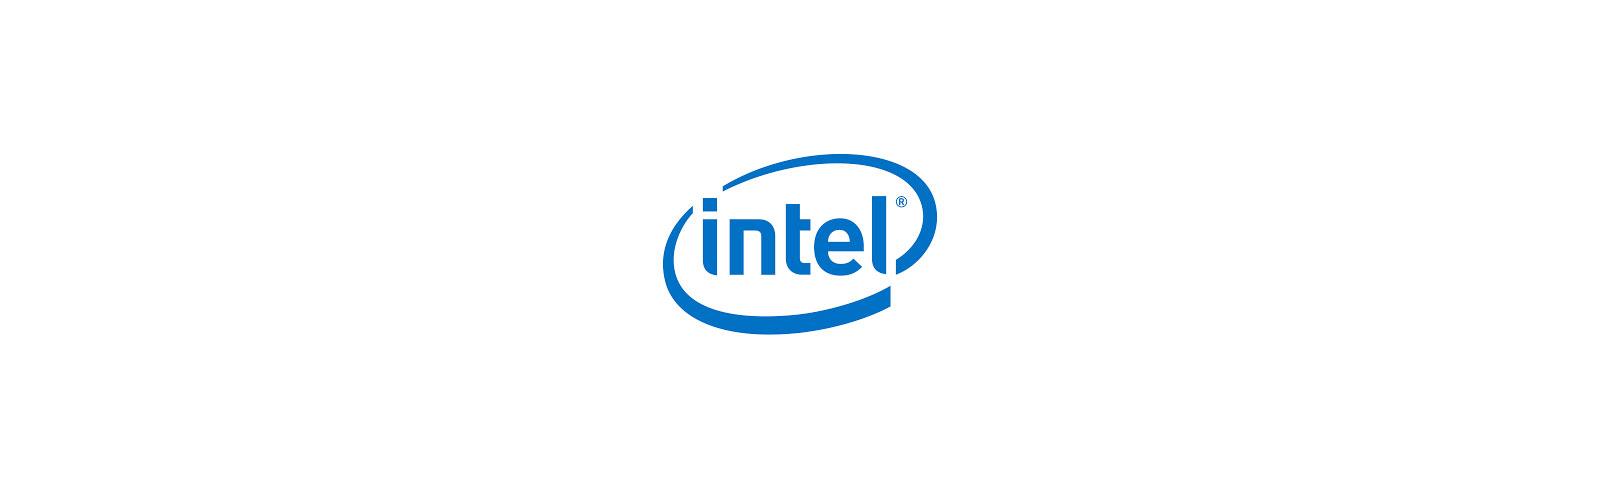 Intel exits the 5G smartphone modem business